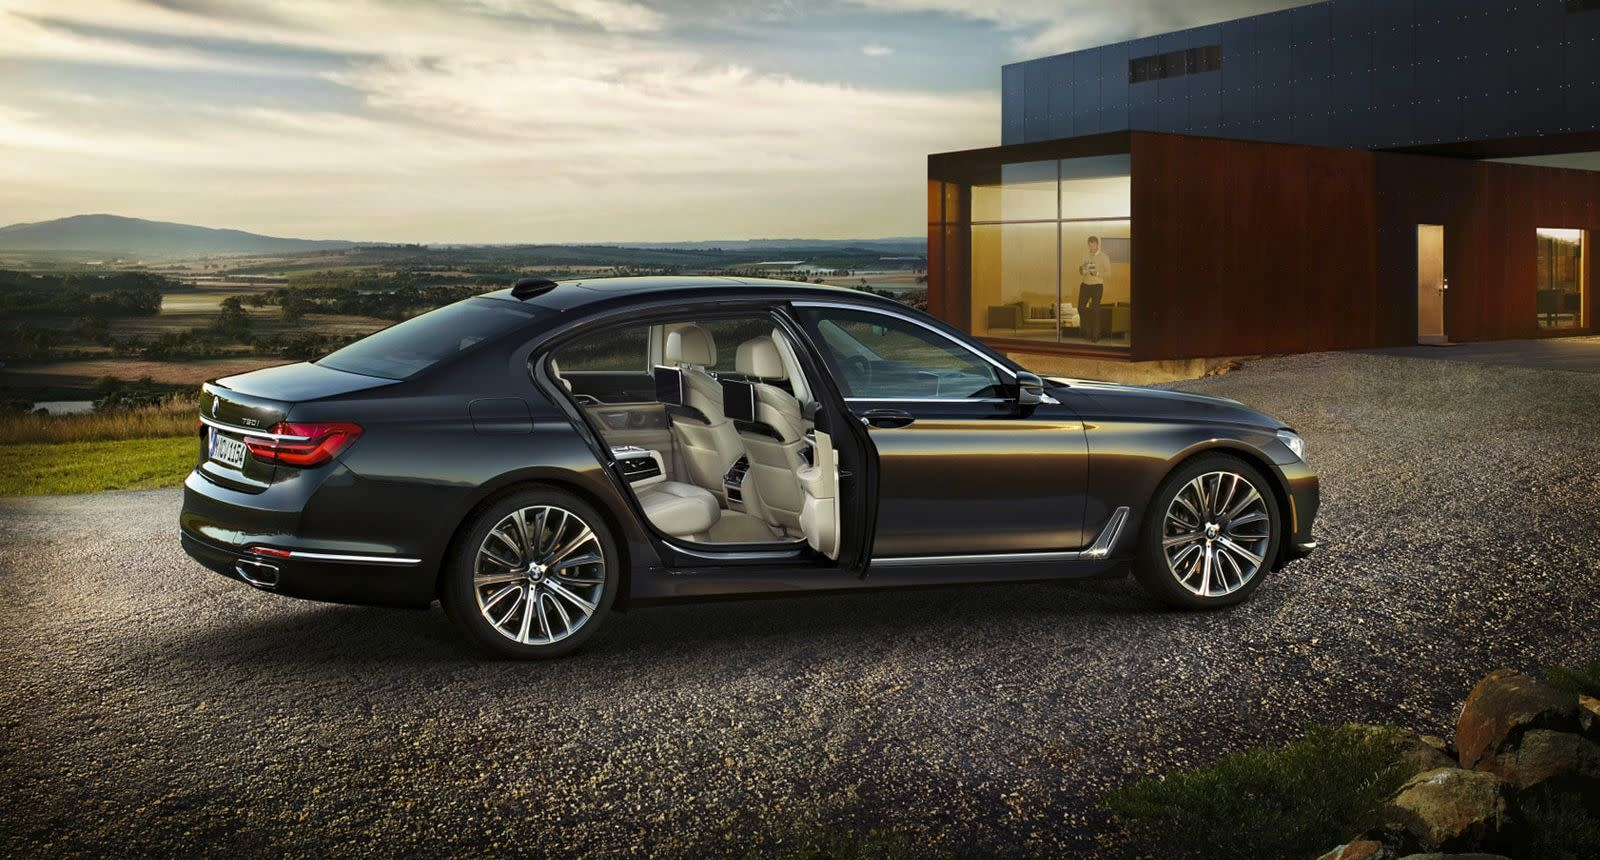 BMW vs Lexus in Indiana